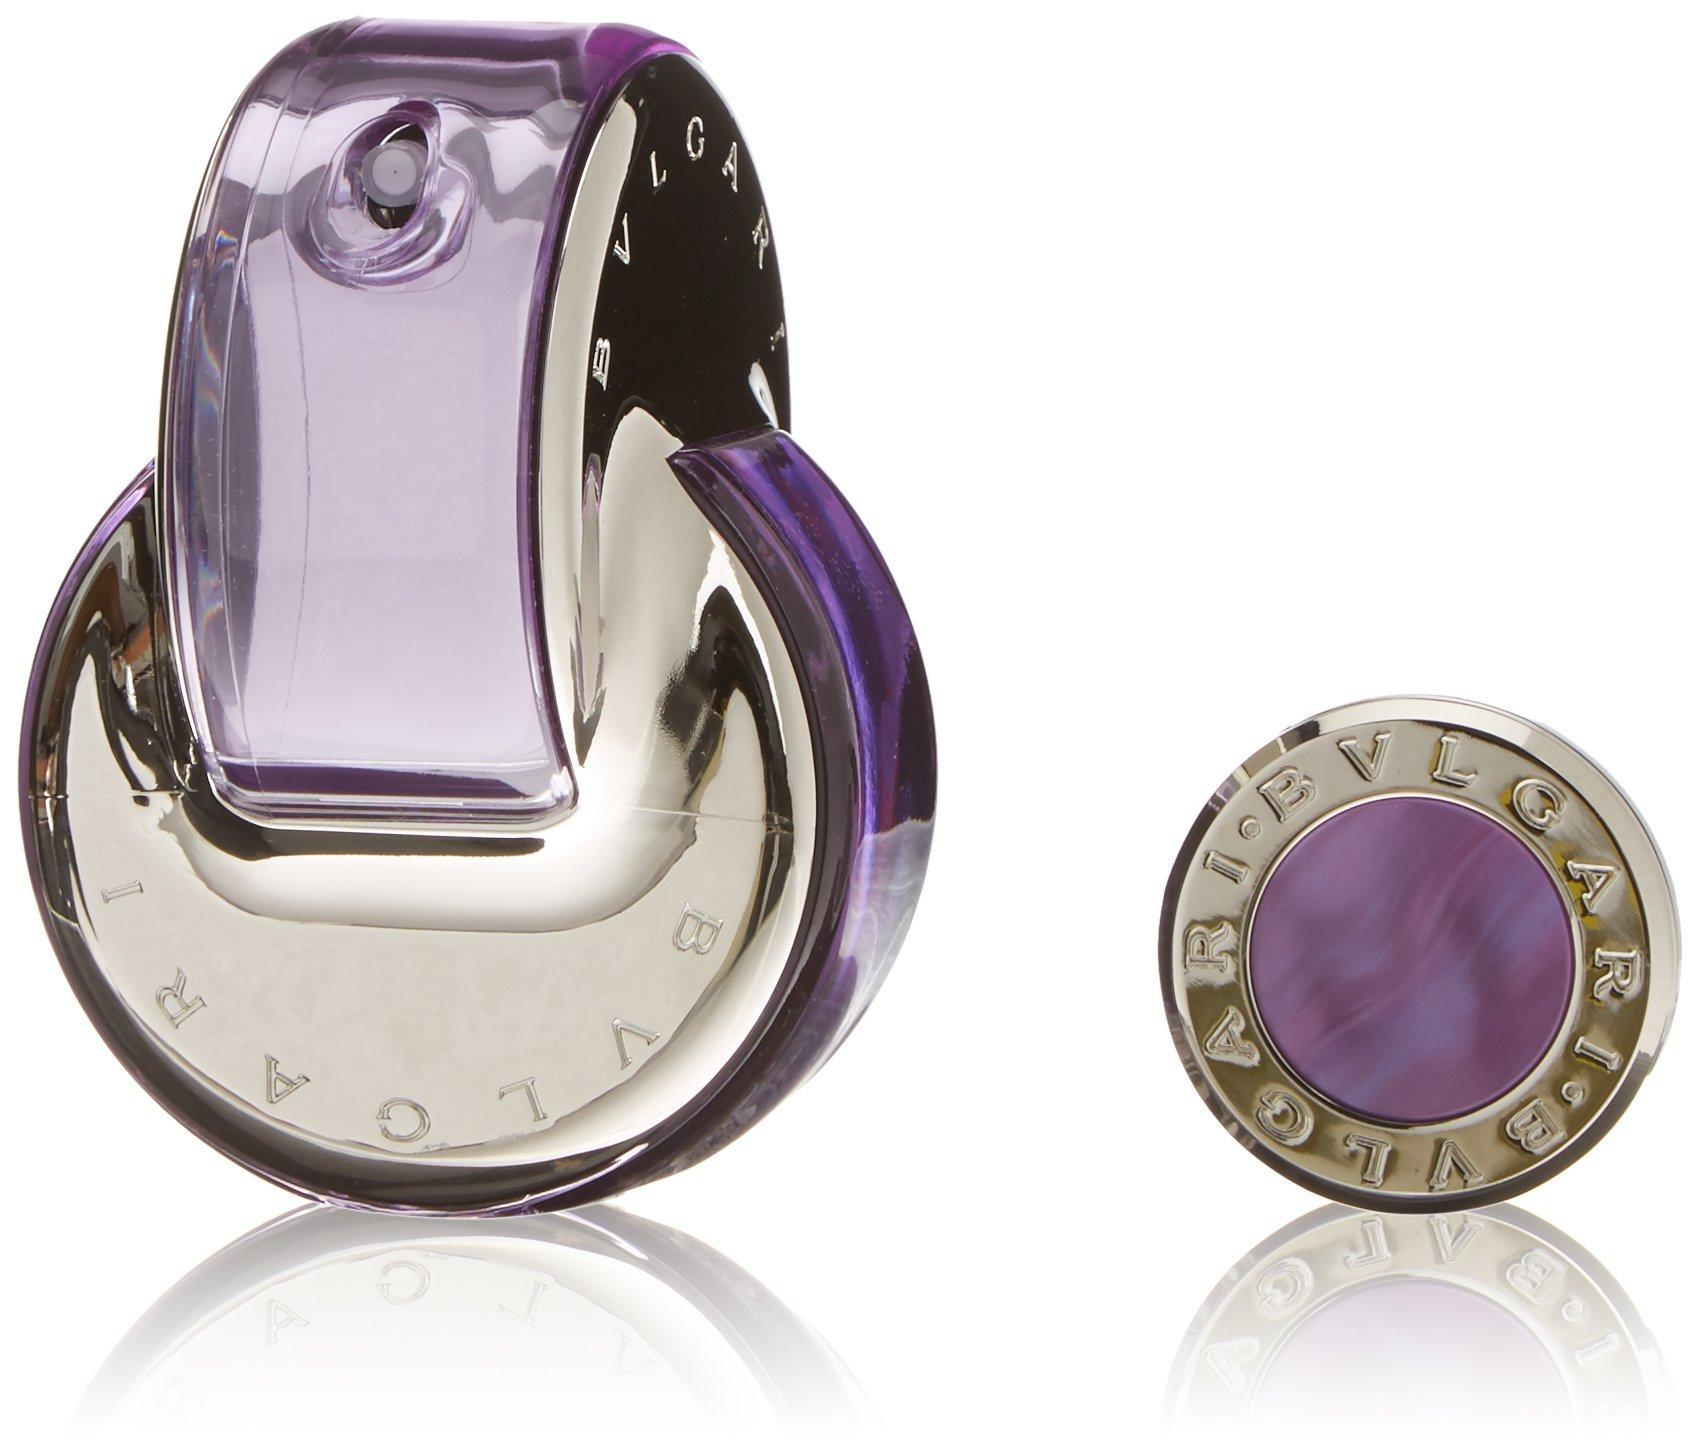 Bvlgari Omnia Amethyste for Women 2 Piece Gift Set (2.2 Ounce Eau de Toilette Spray Plus 0.03 Ounce Solid Perfume)